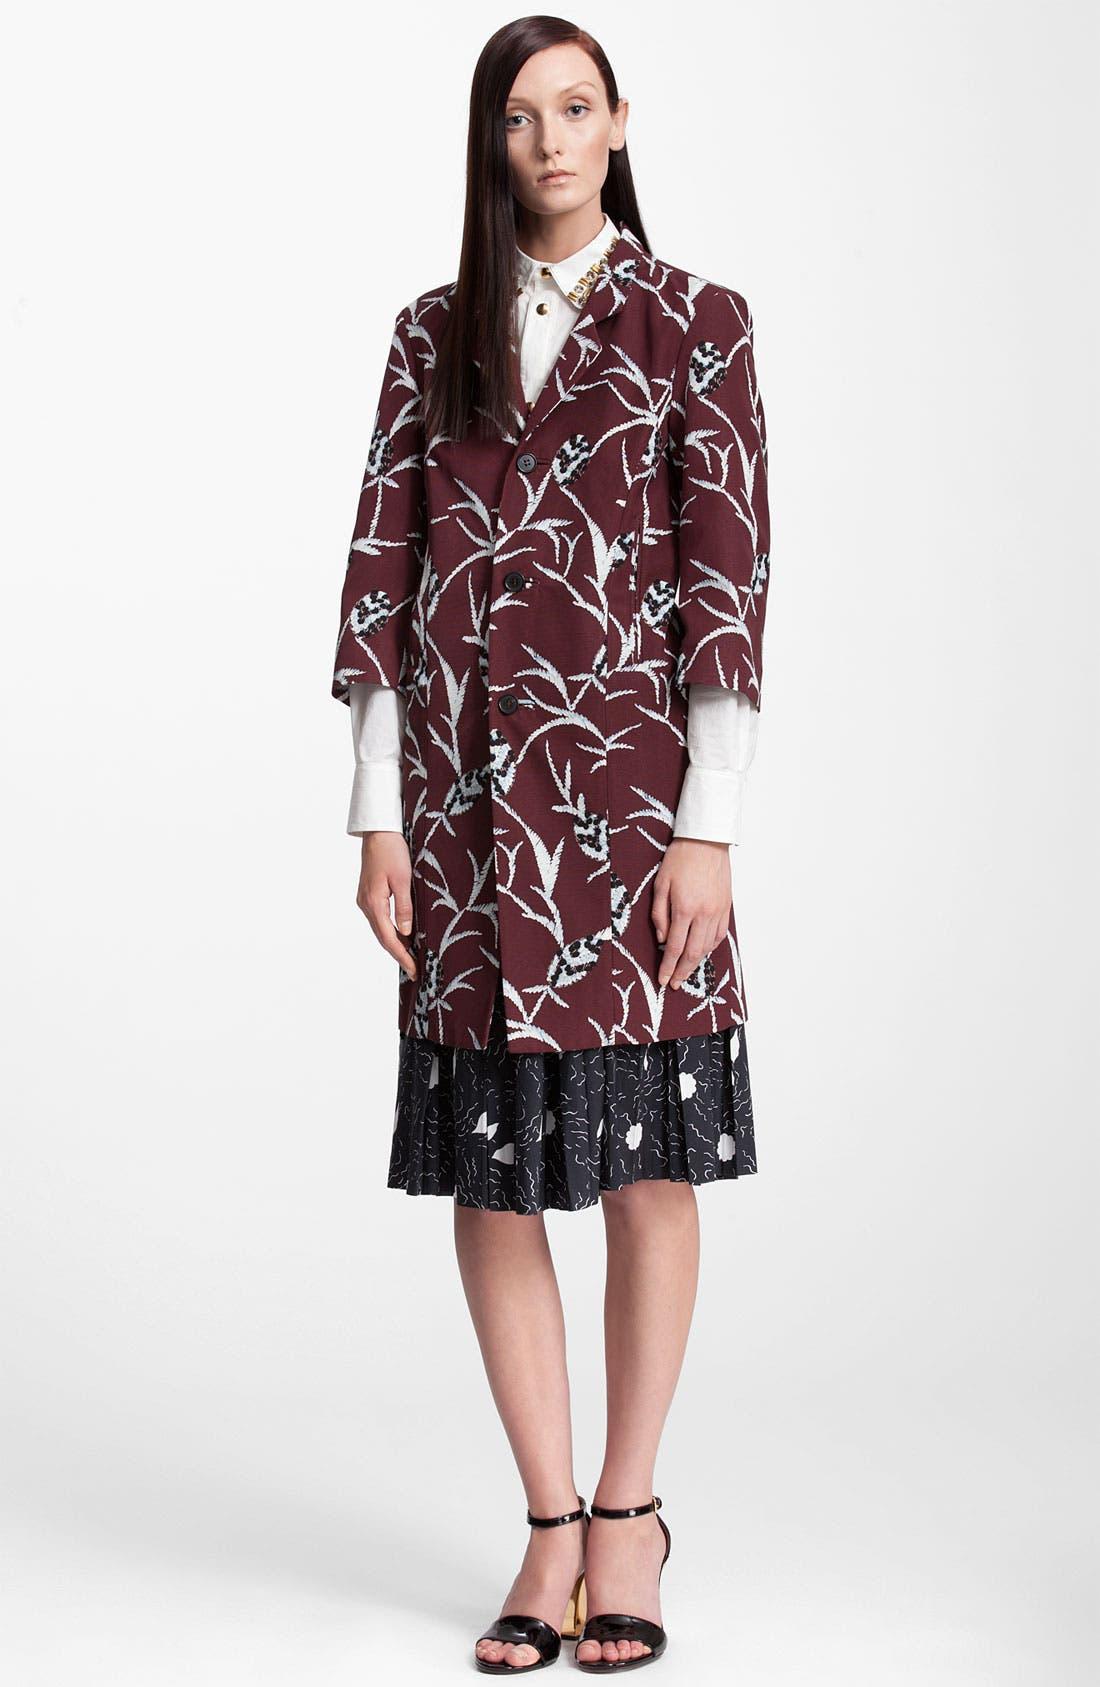 Alternate Image 1 Selected - Marni Floral Structure Print Cotton Blend Coat